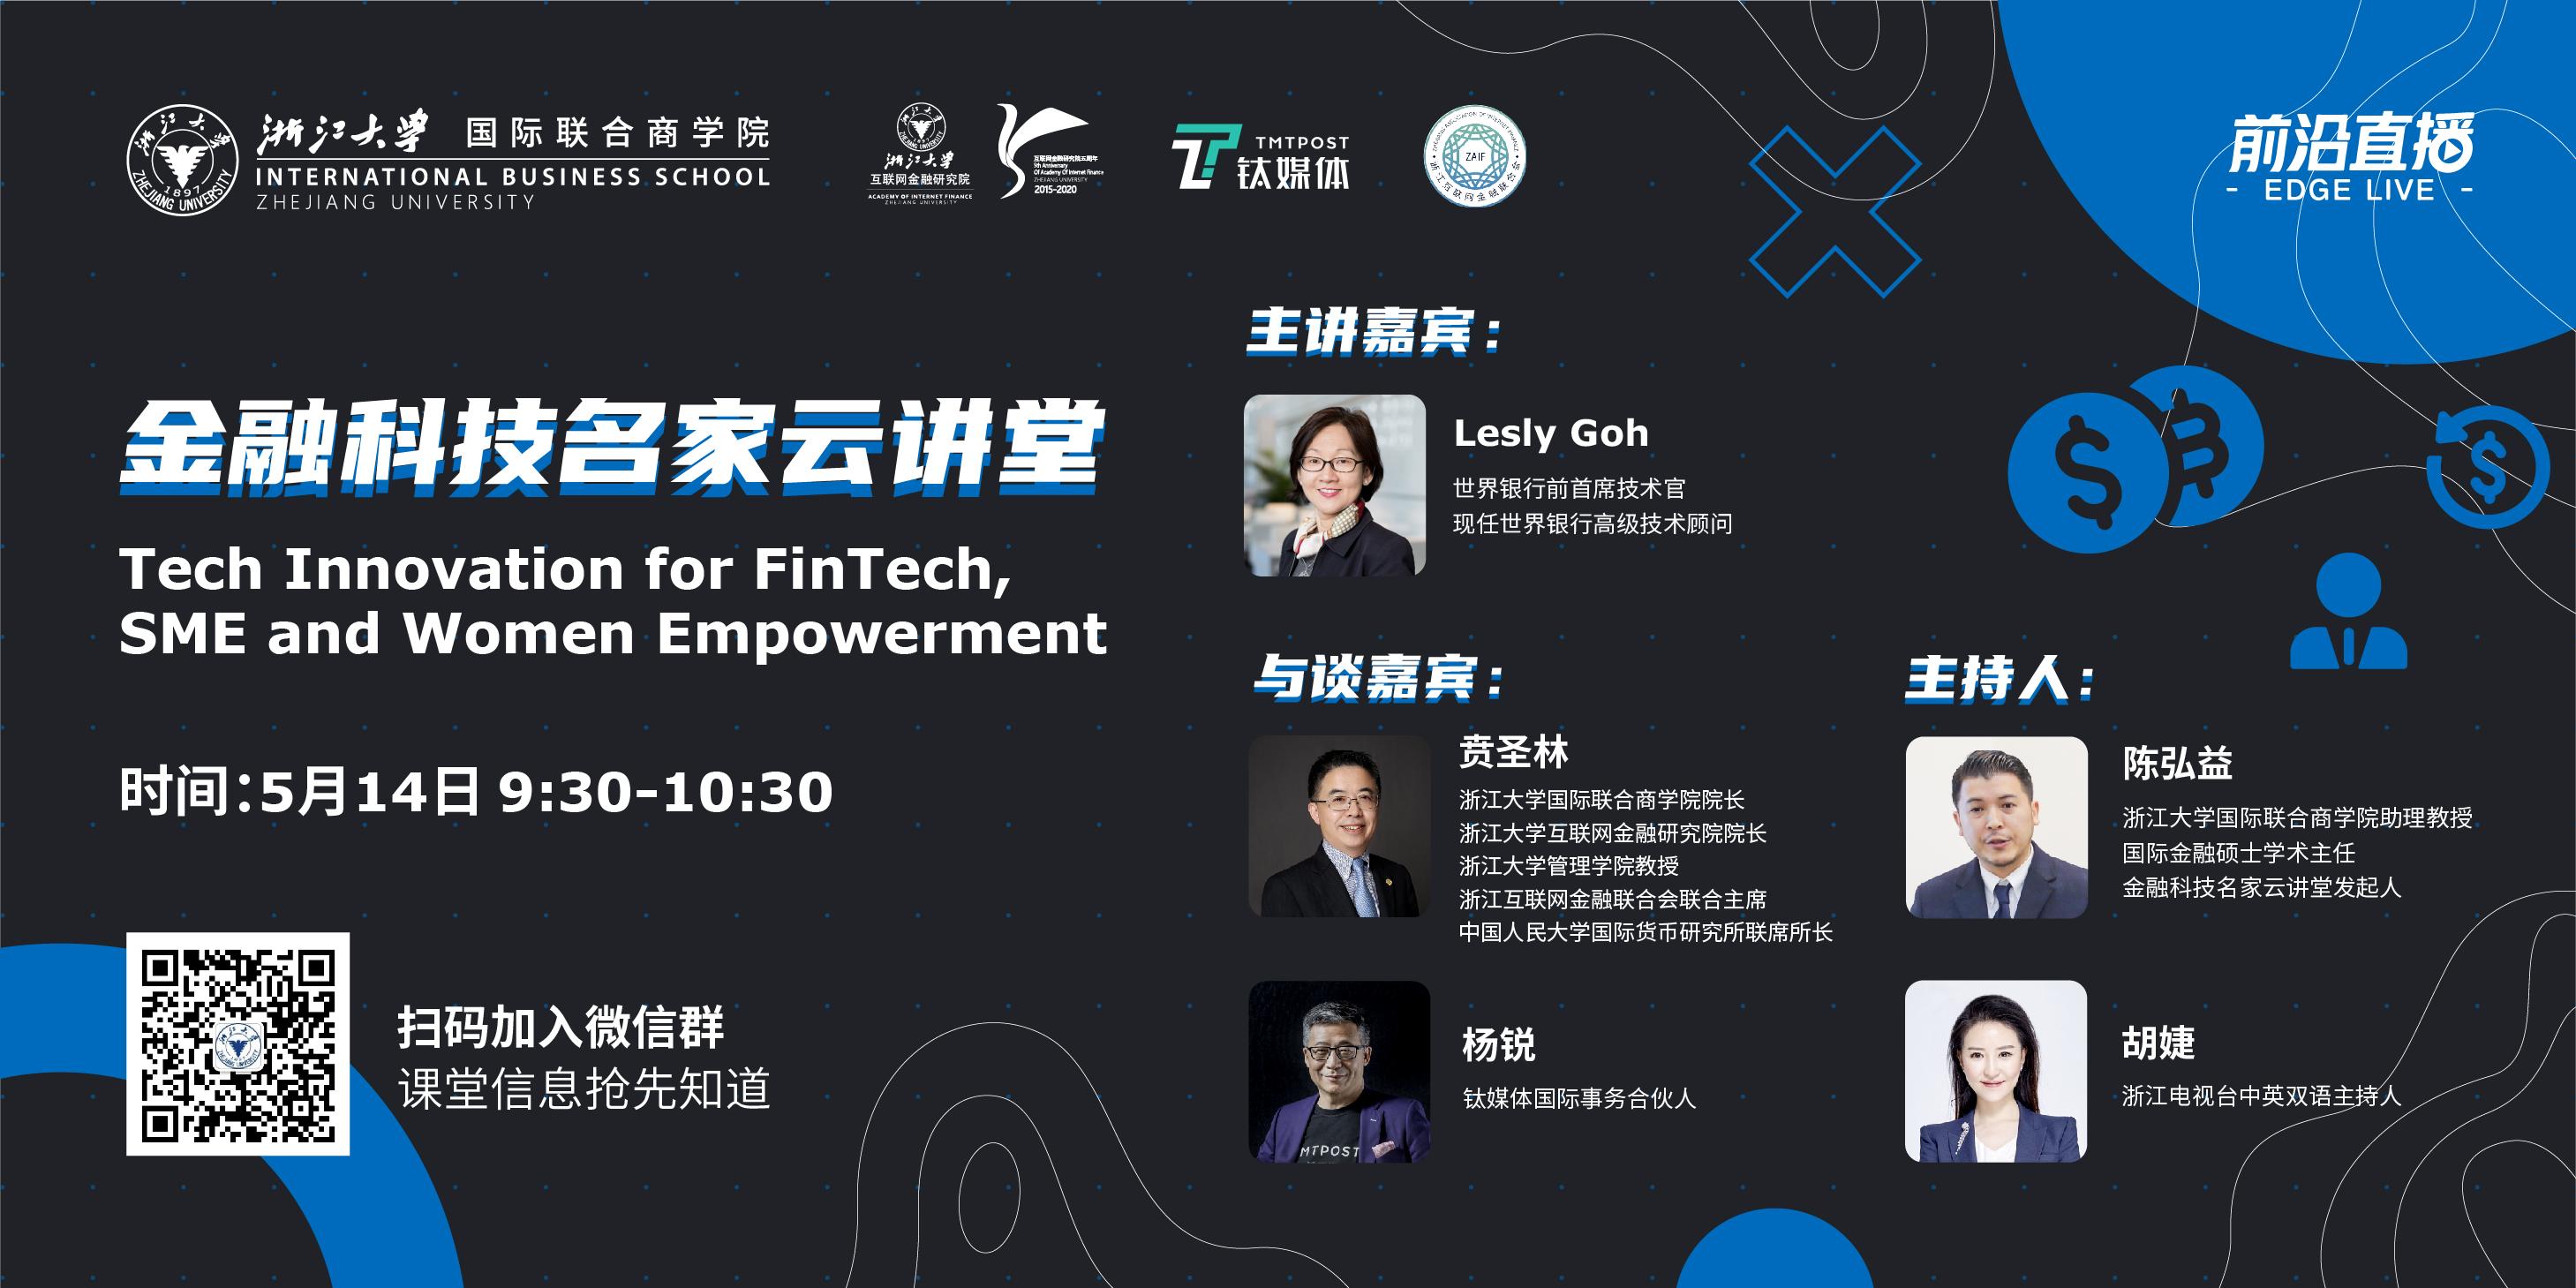 金融科技名家云讲堂:Tech Innovation for FinTech, SME and Women Empowerment